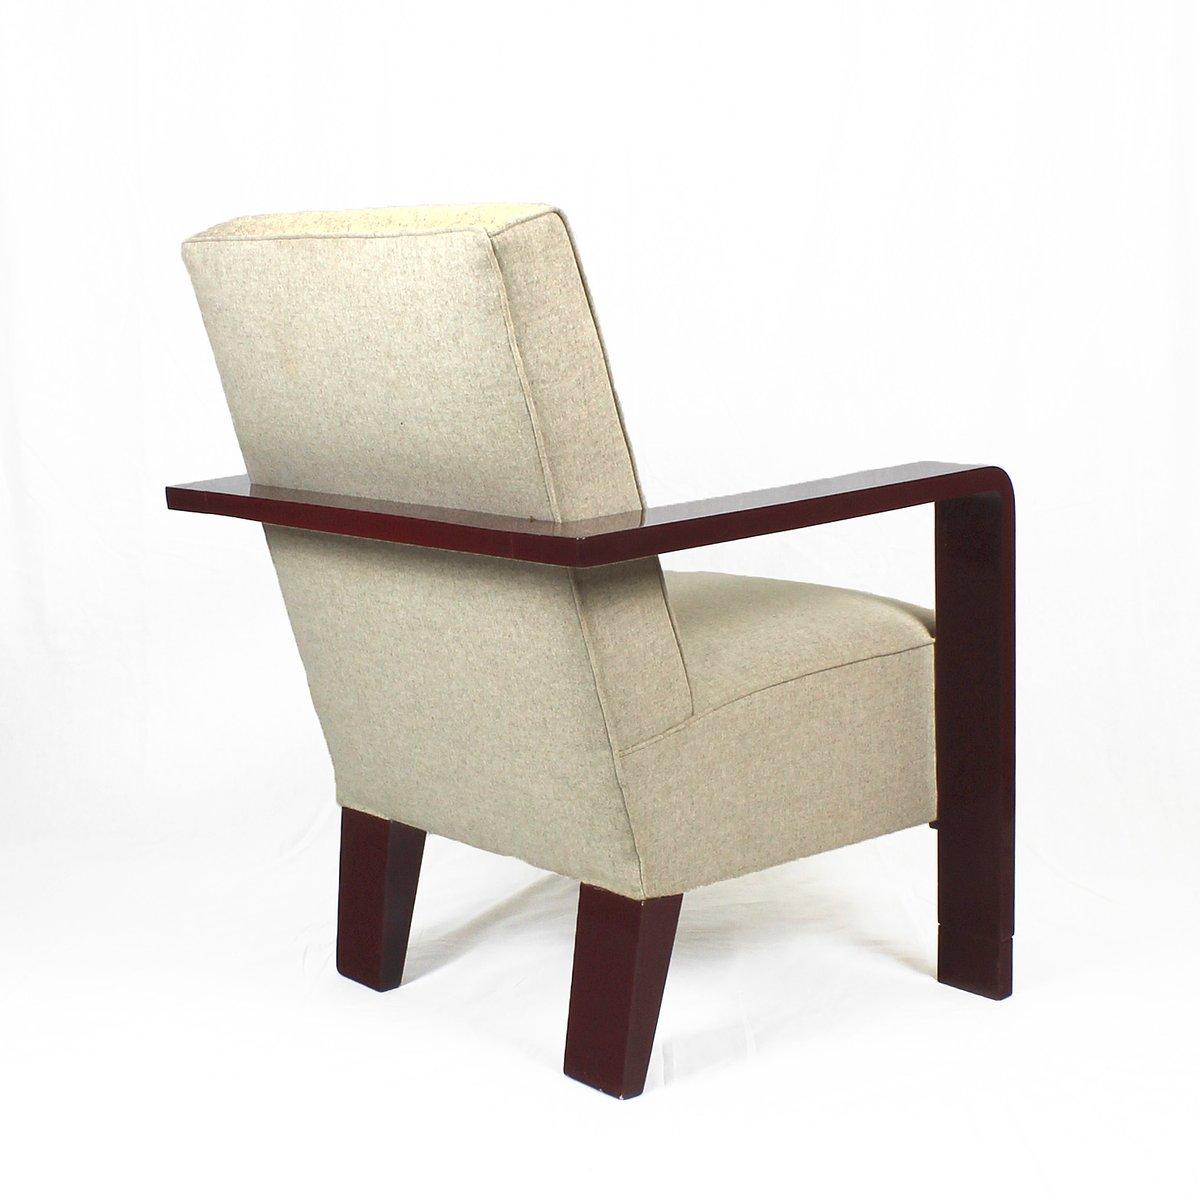 Artdeco Sessel kubistische deco sessel 1930er 2er set bei pamono kaufen